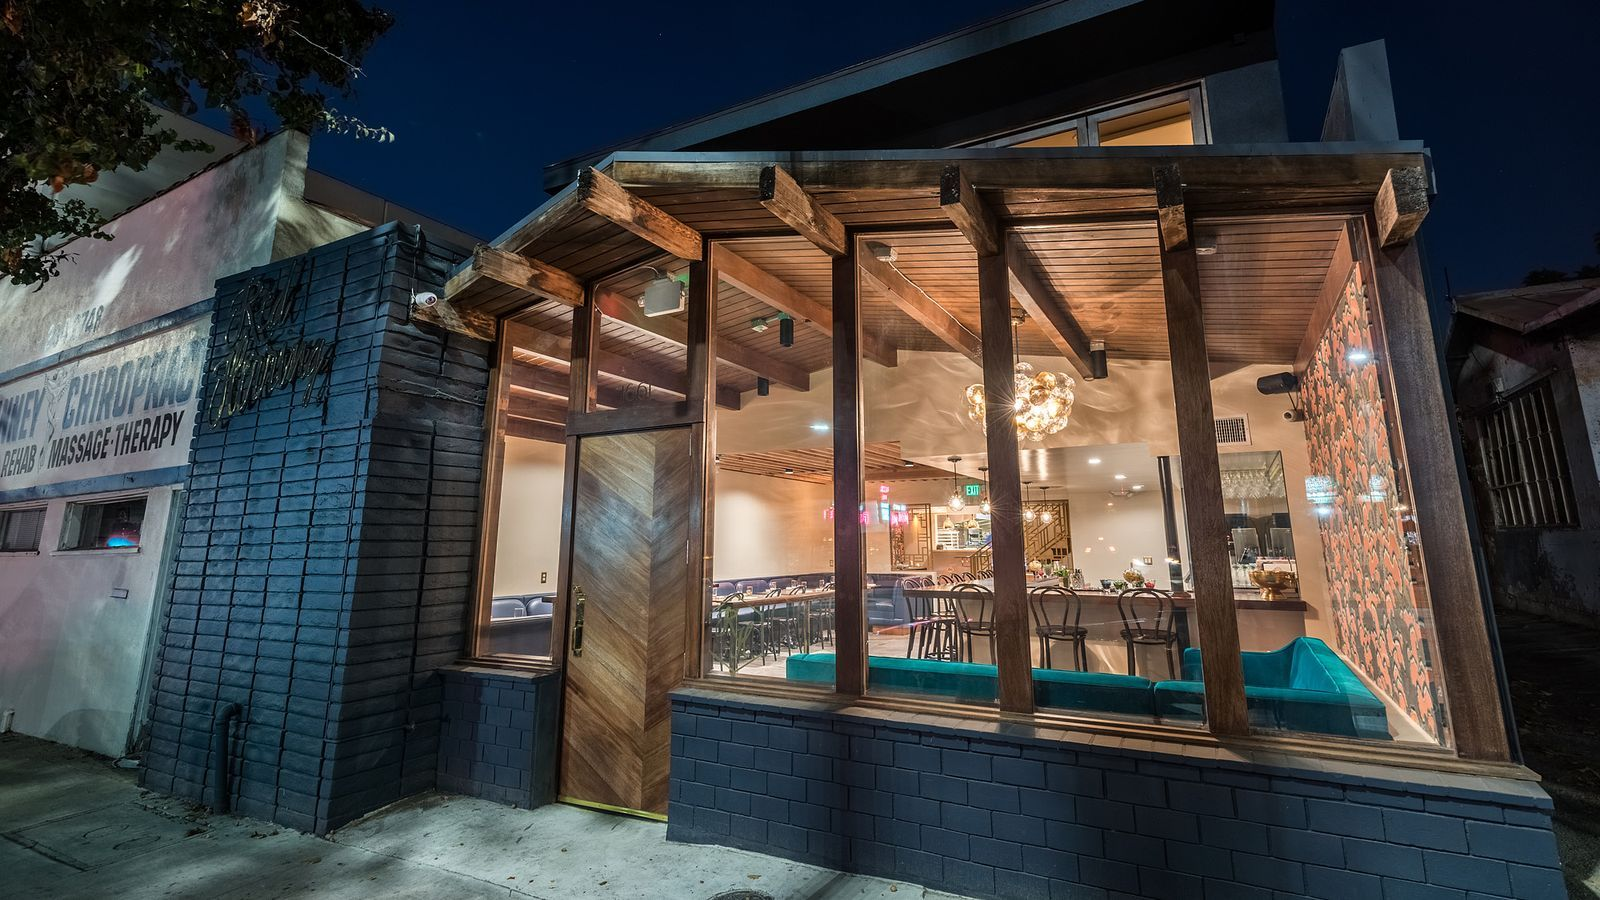 Inside Red Herring, Eagle Rock's edgy new dinner destination